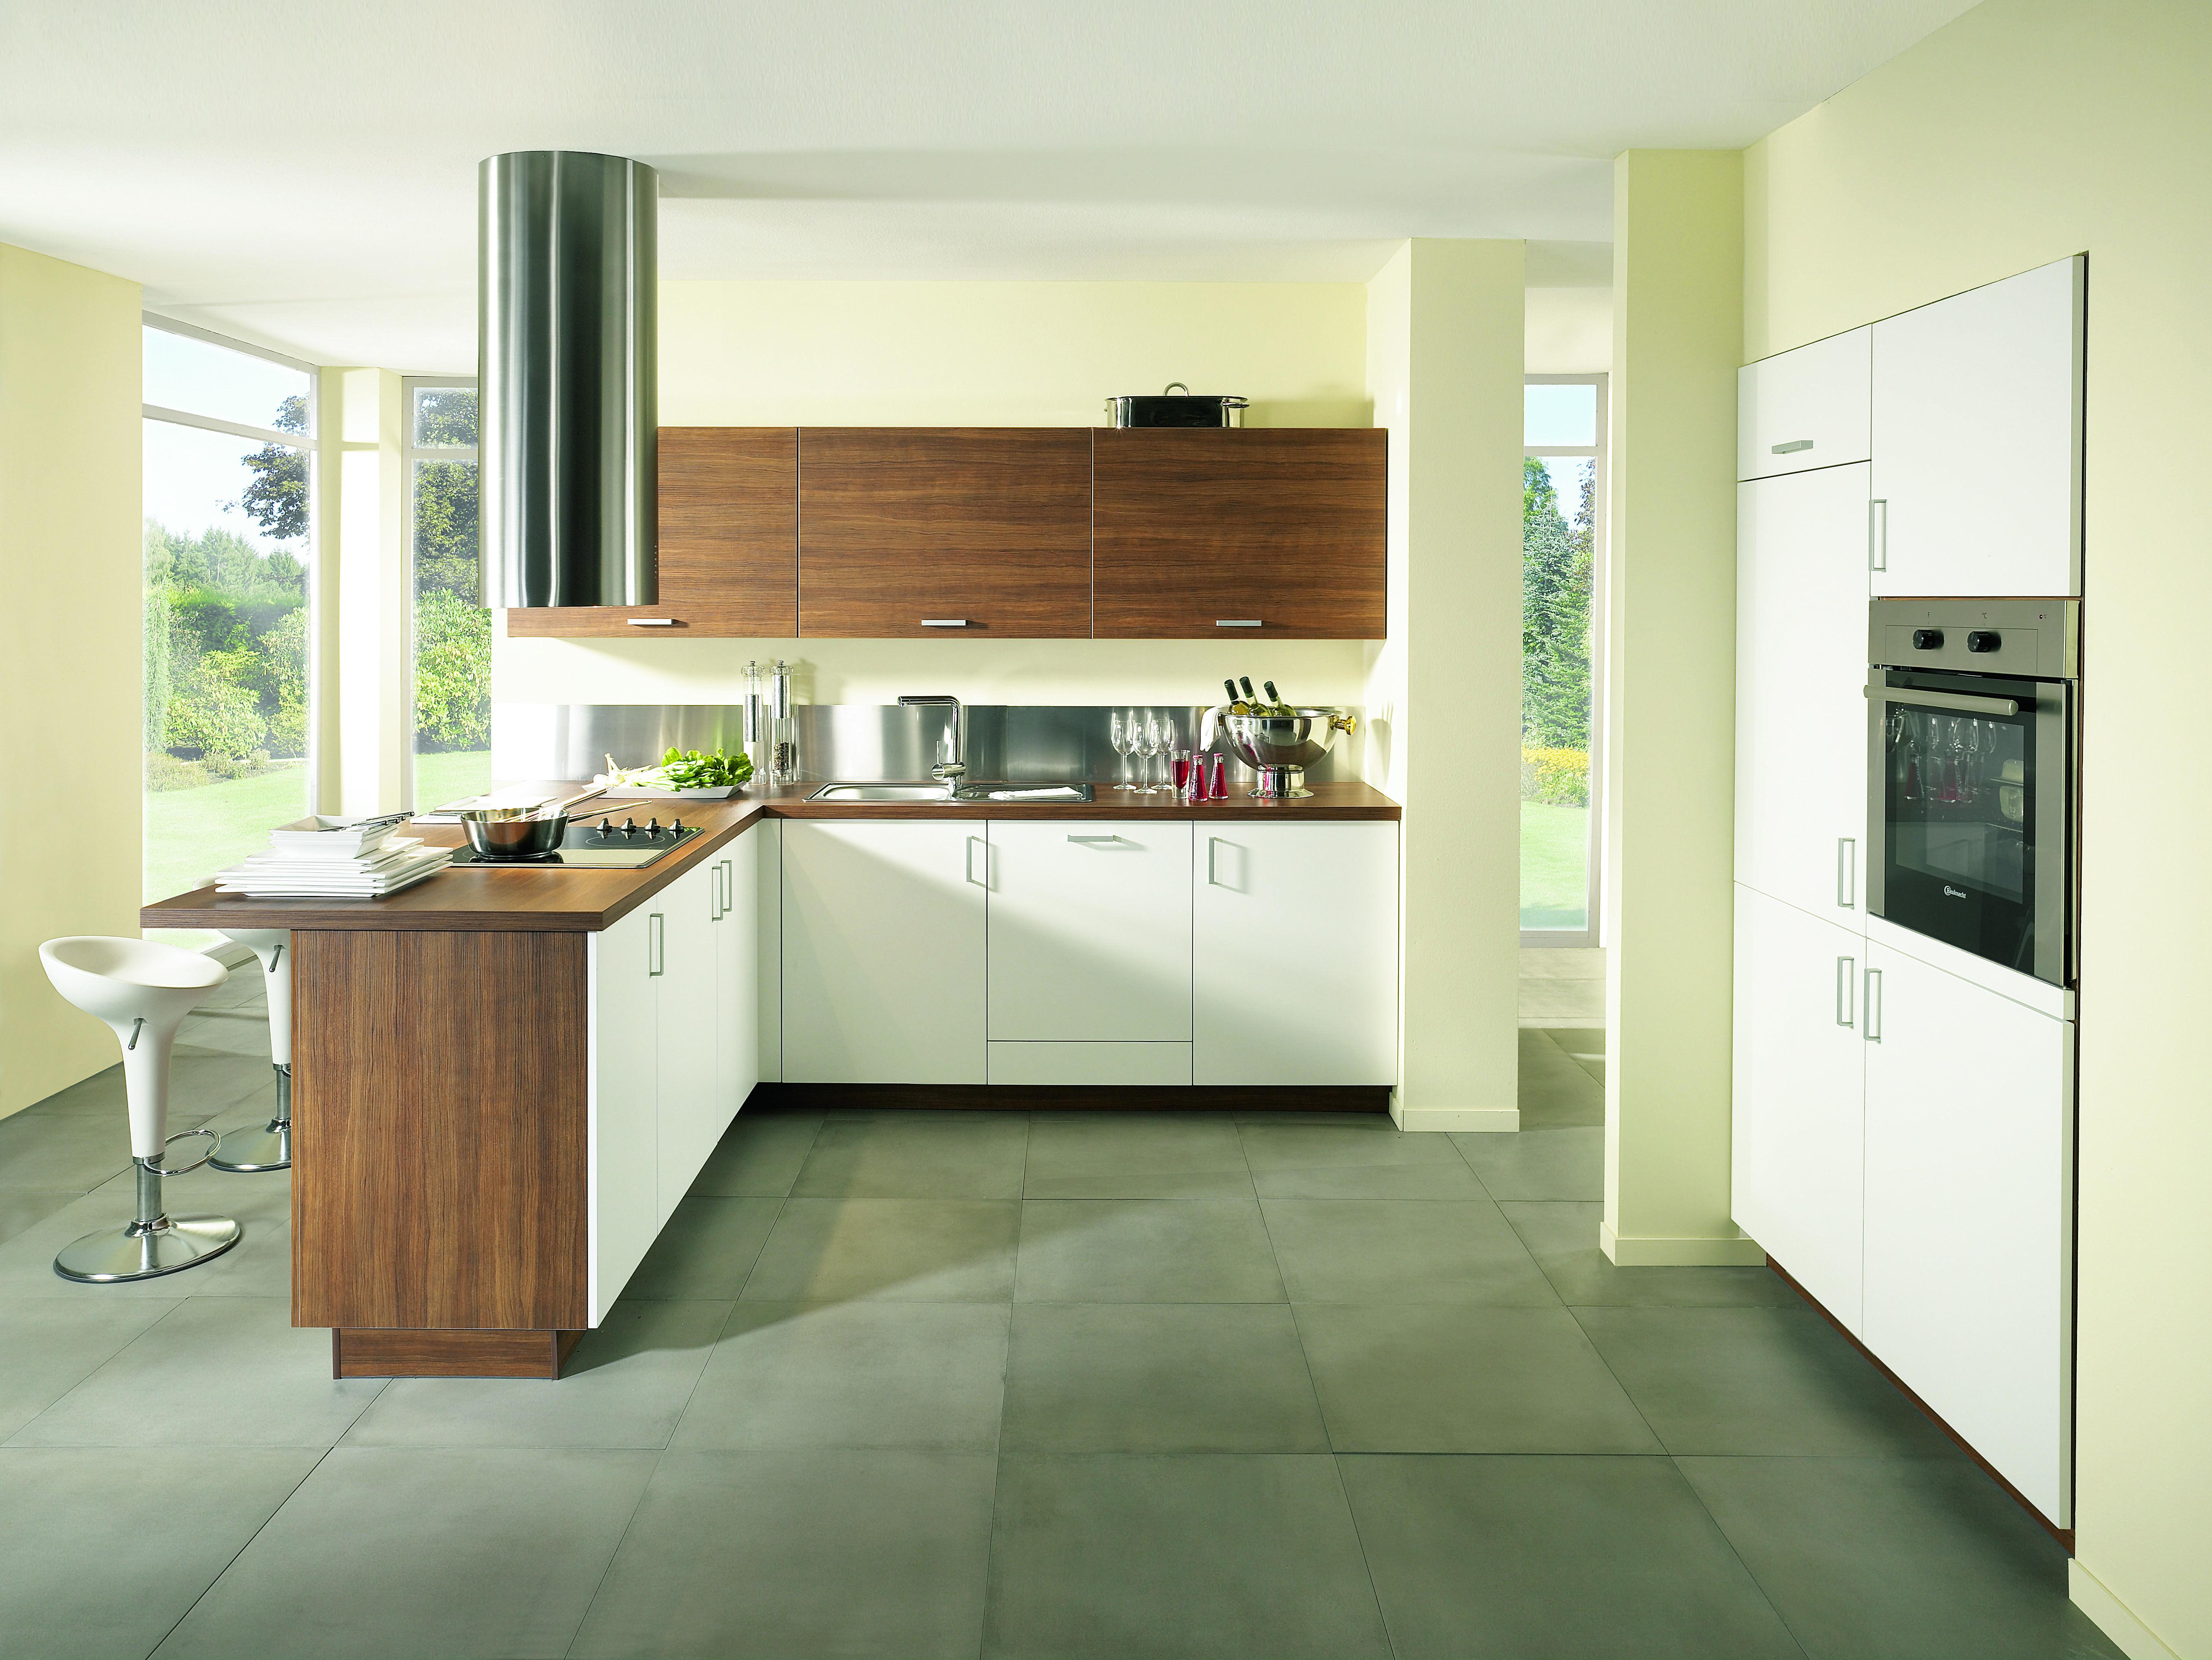 cabinet ideas european kitchens european kitchen design modern kitchen set on kitchen ideas european id=49427